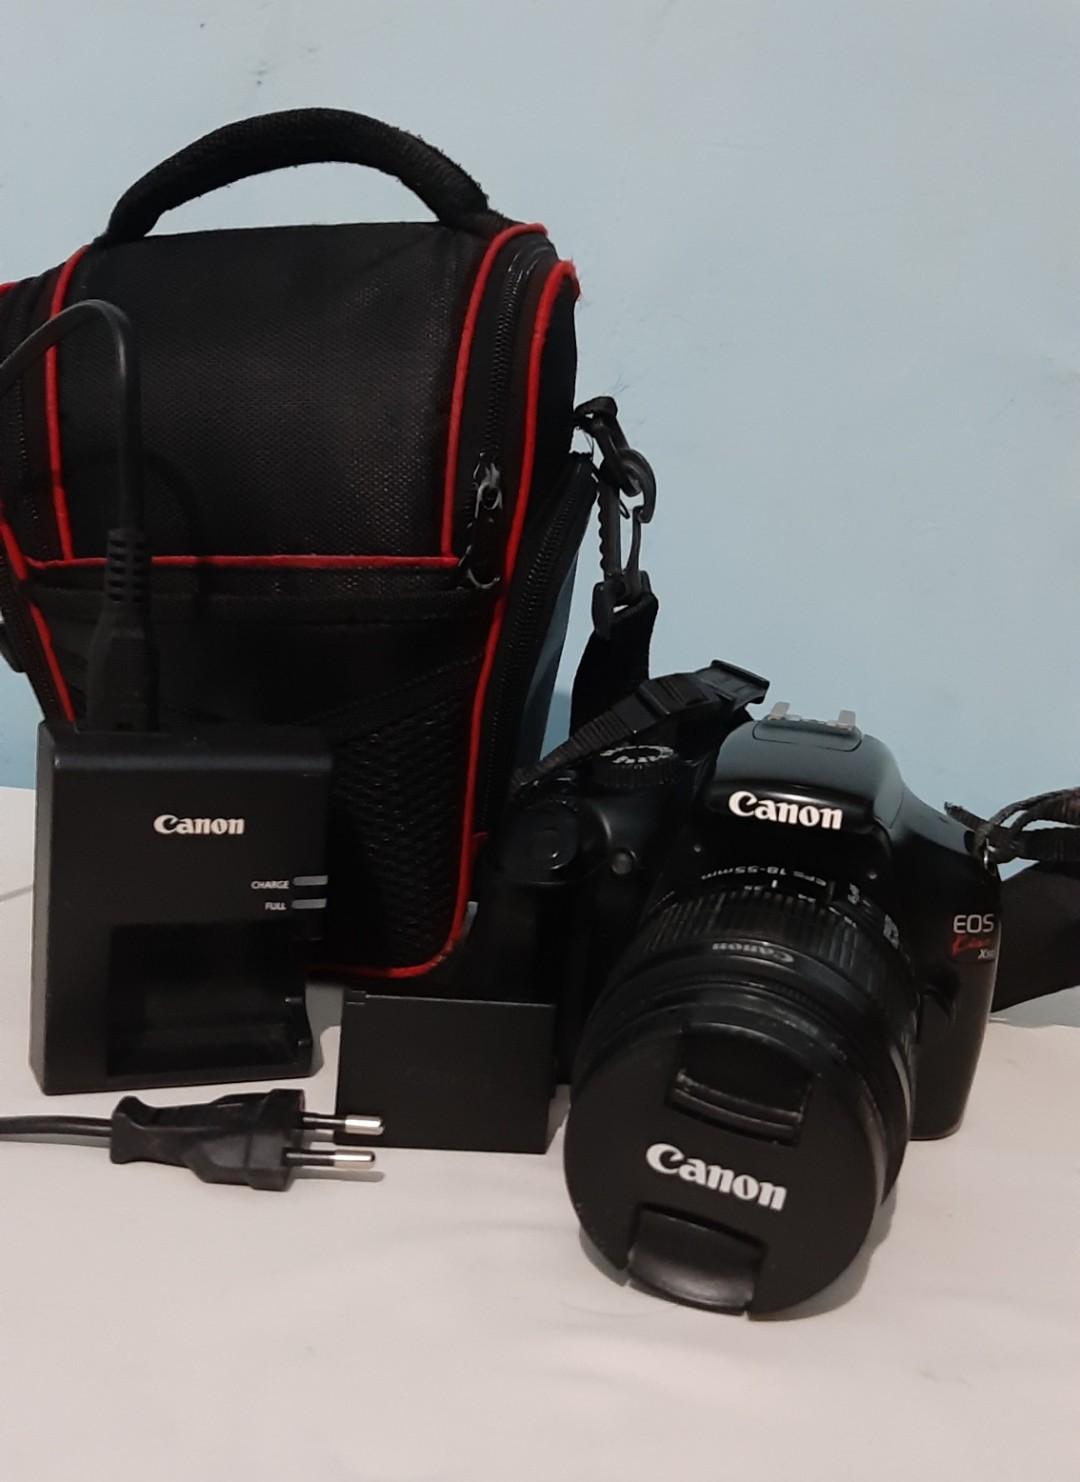 DSLR Canon eos kiss x50